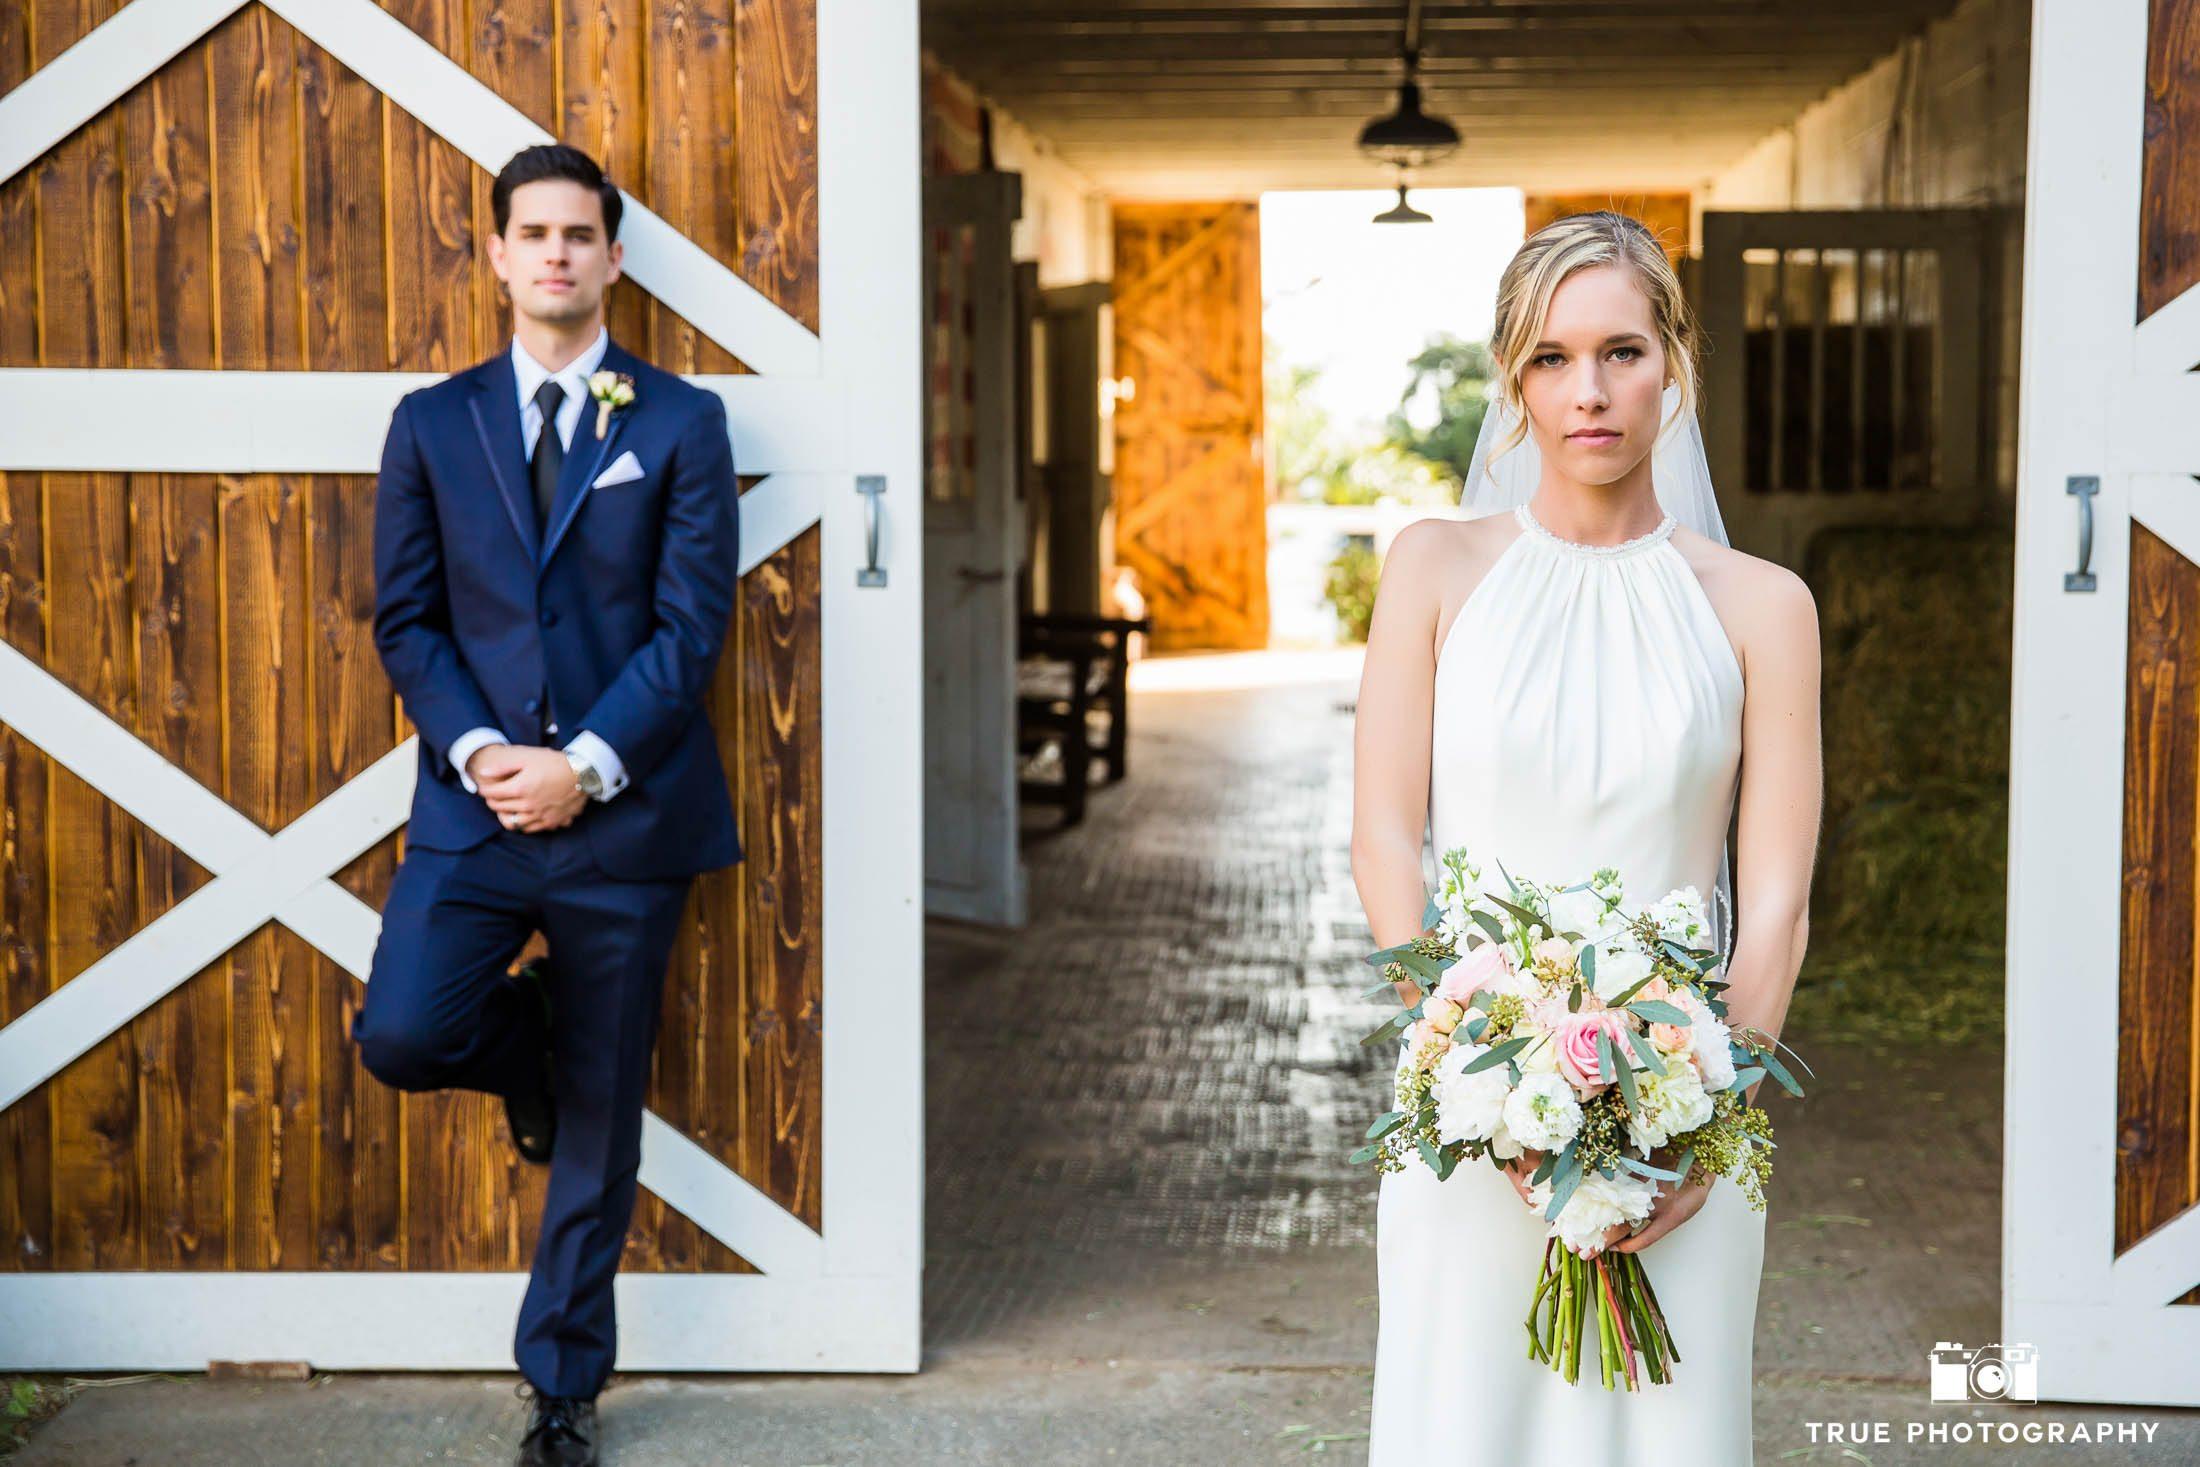 Bride and Groom stand in front of rustic barn door after outdoor ceremony